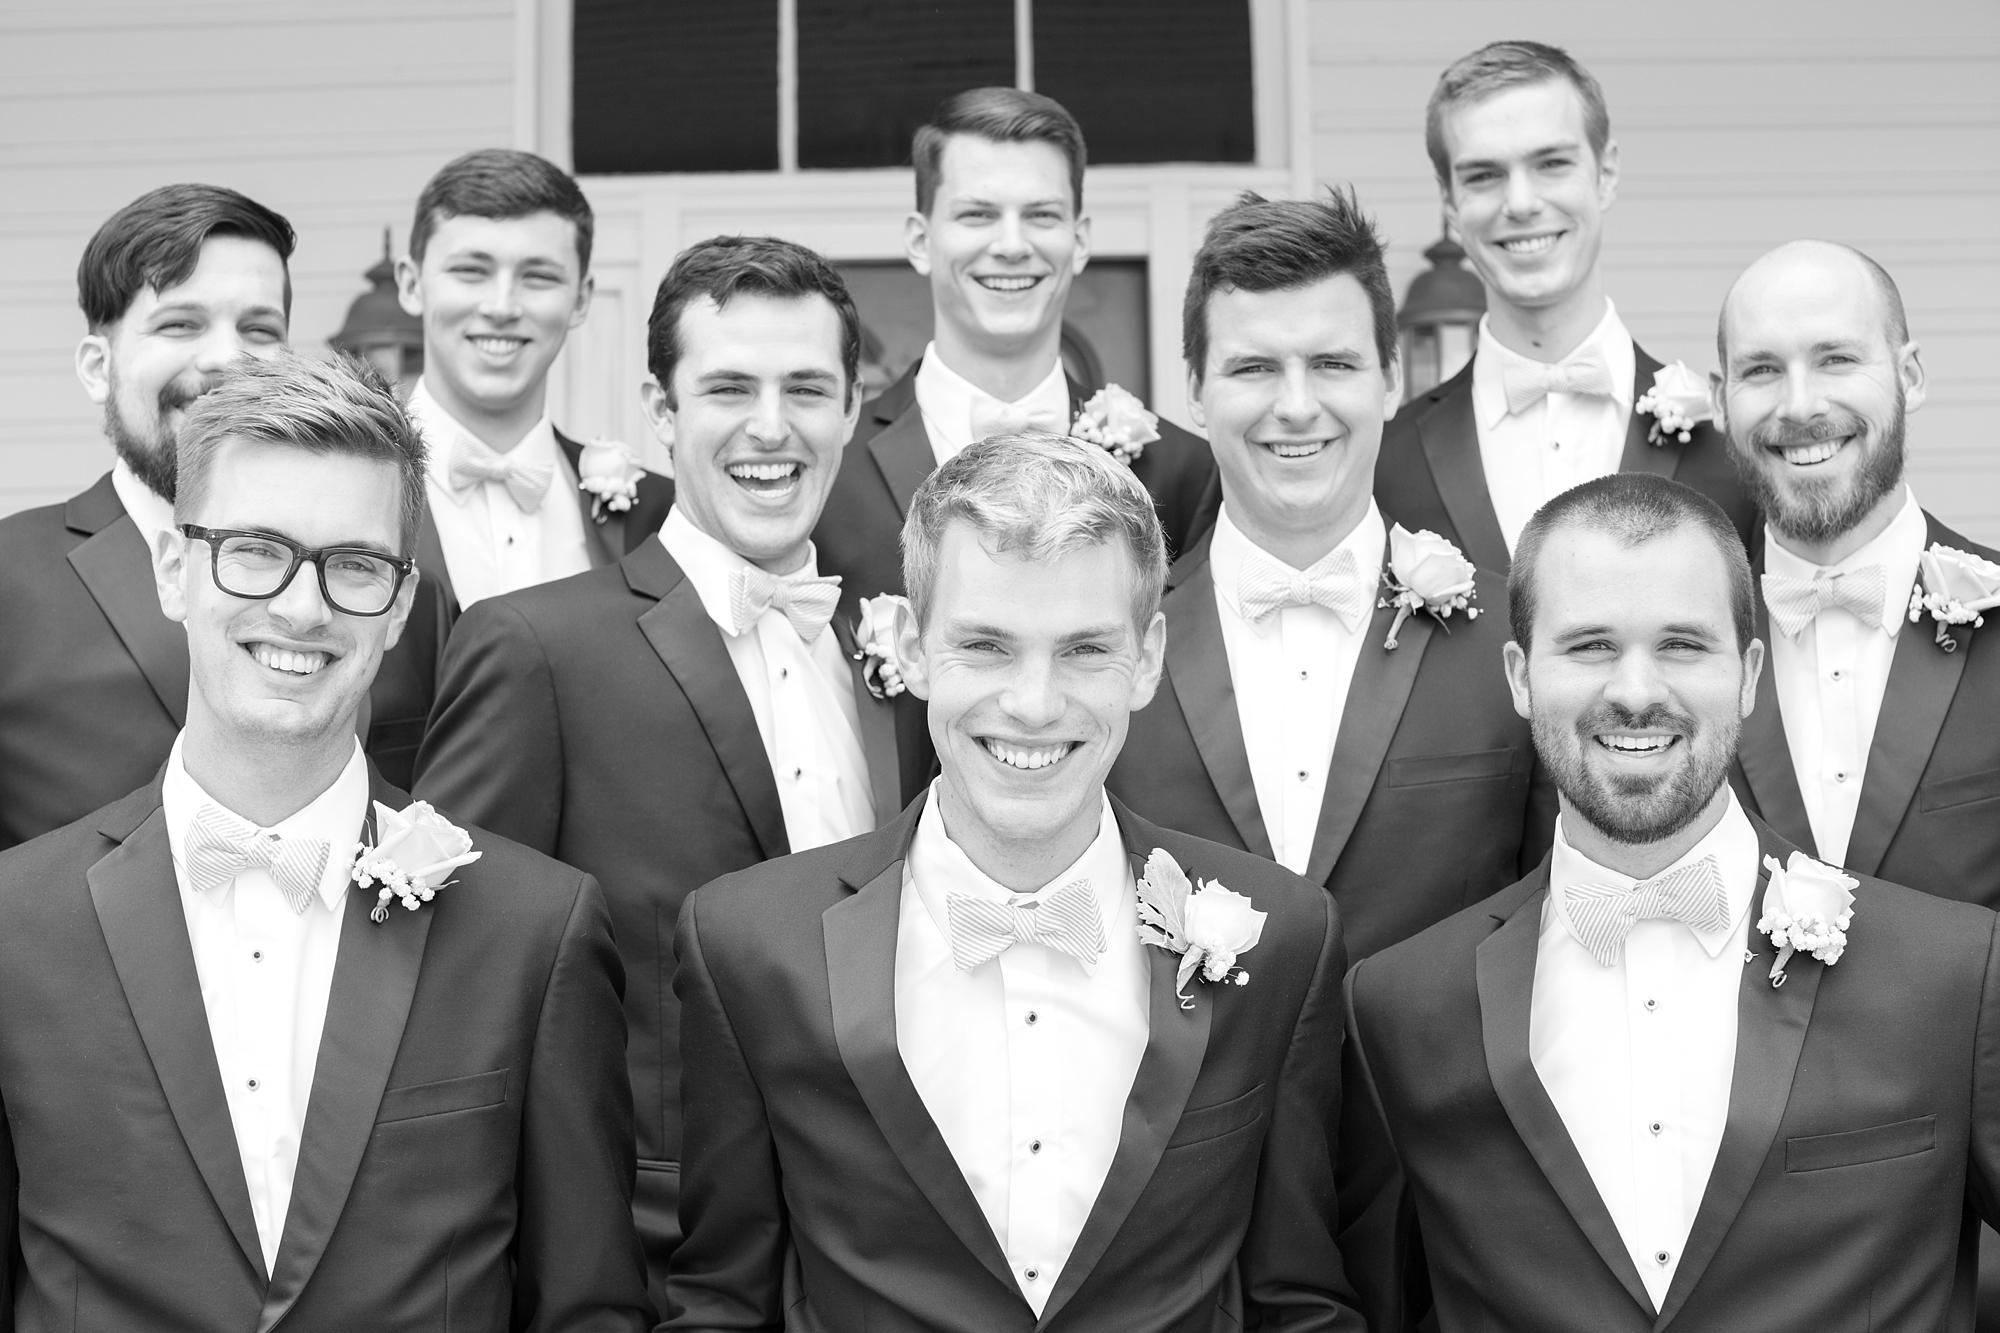 Russell 2-Bridal Party-100_anna grace photography baltimore maryland wedding photographer elkridge furnace inn wedding photo.jpg